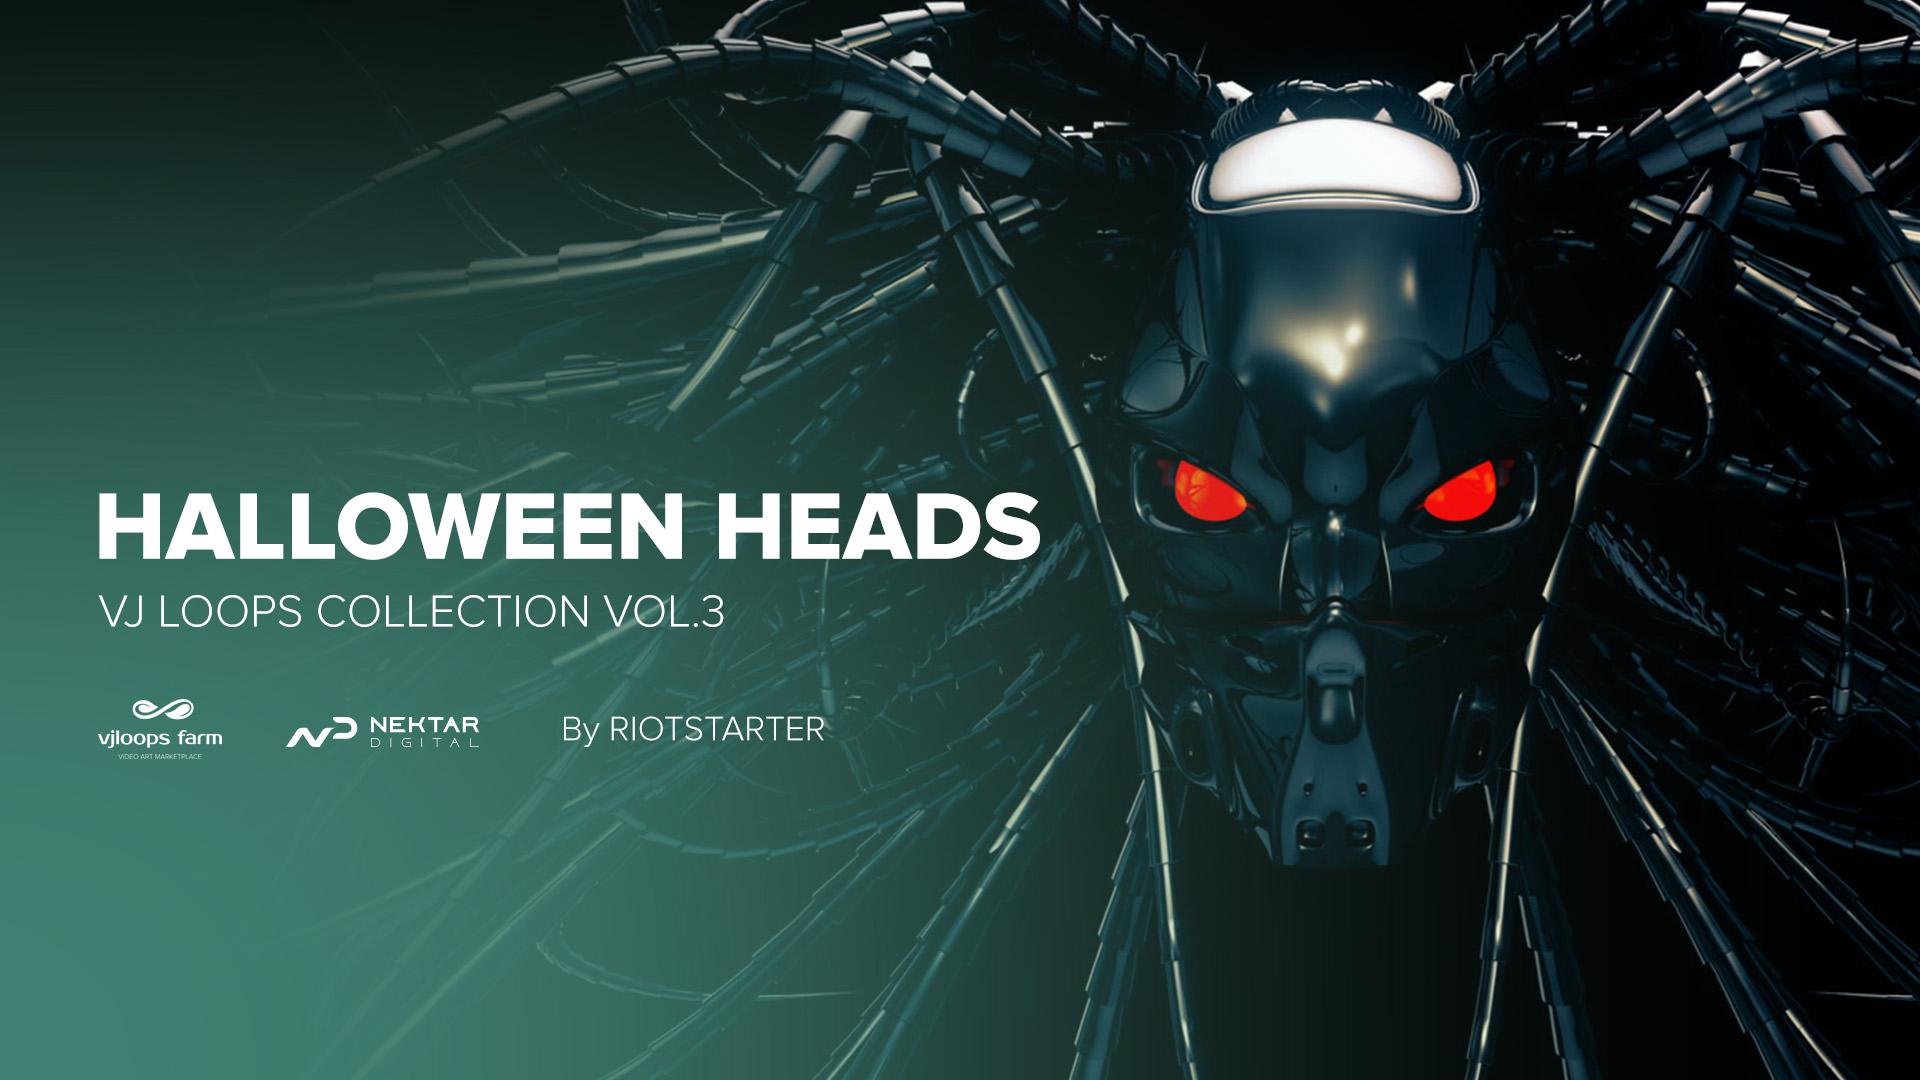 Halloweeen-heads